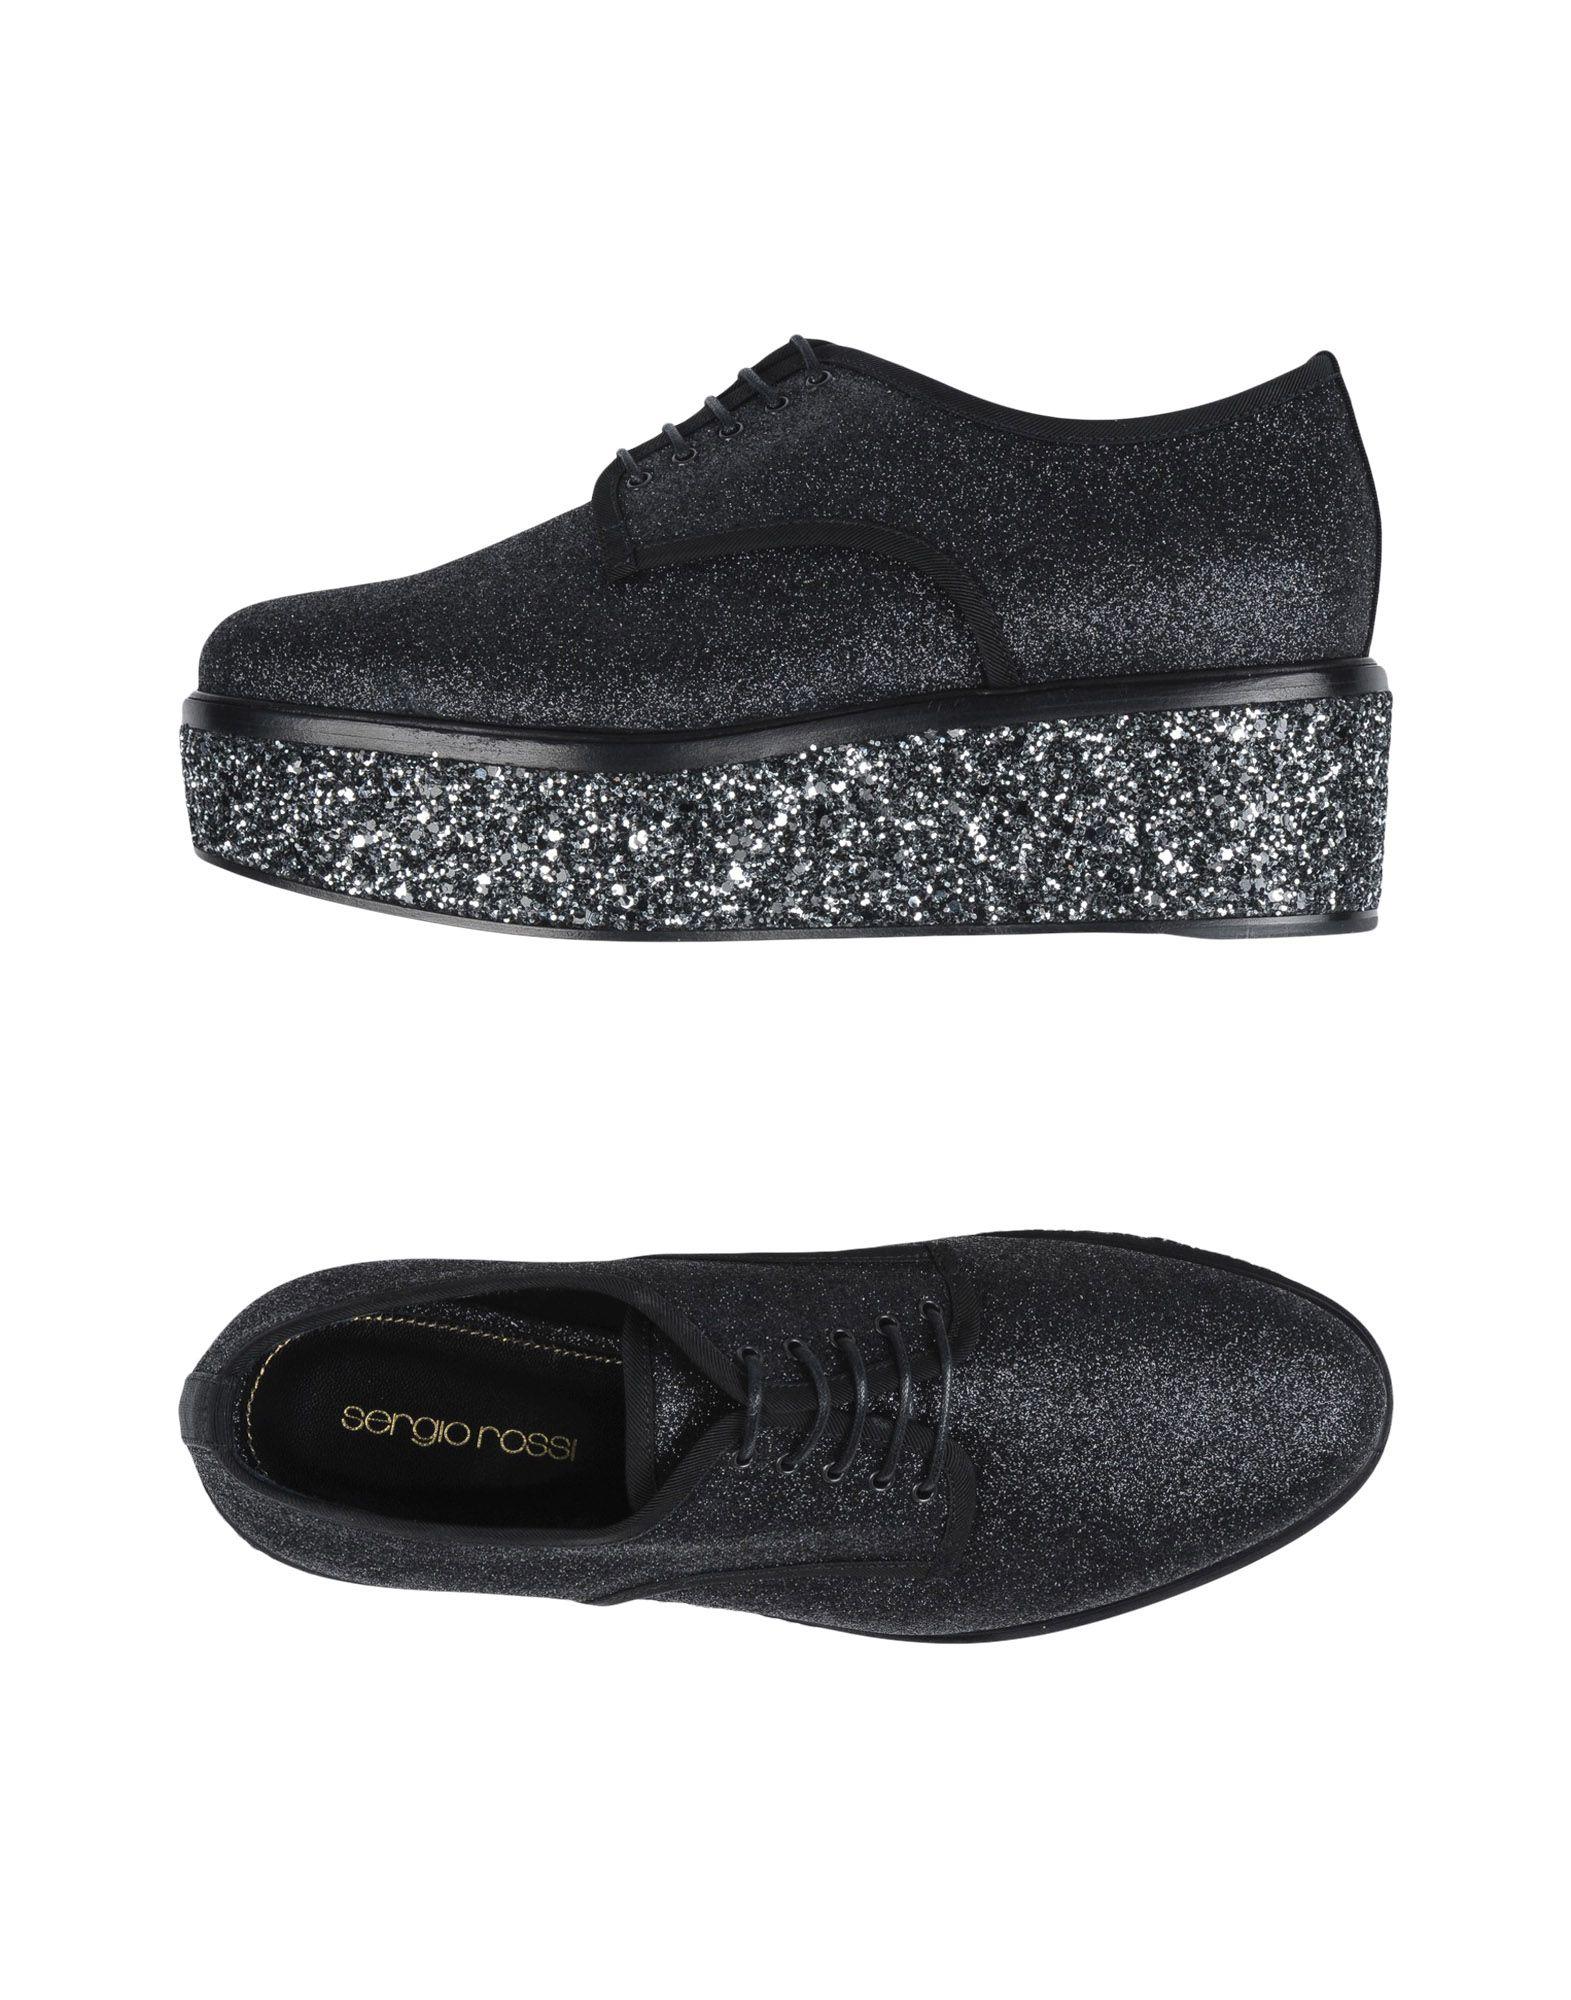 Rabatt Schuhe Schnürschuhe Sergio Rossi Schnürschuhe Schuhe Damen  11255275JI 36f60c